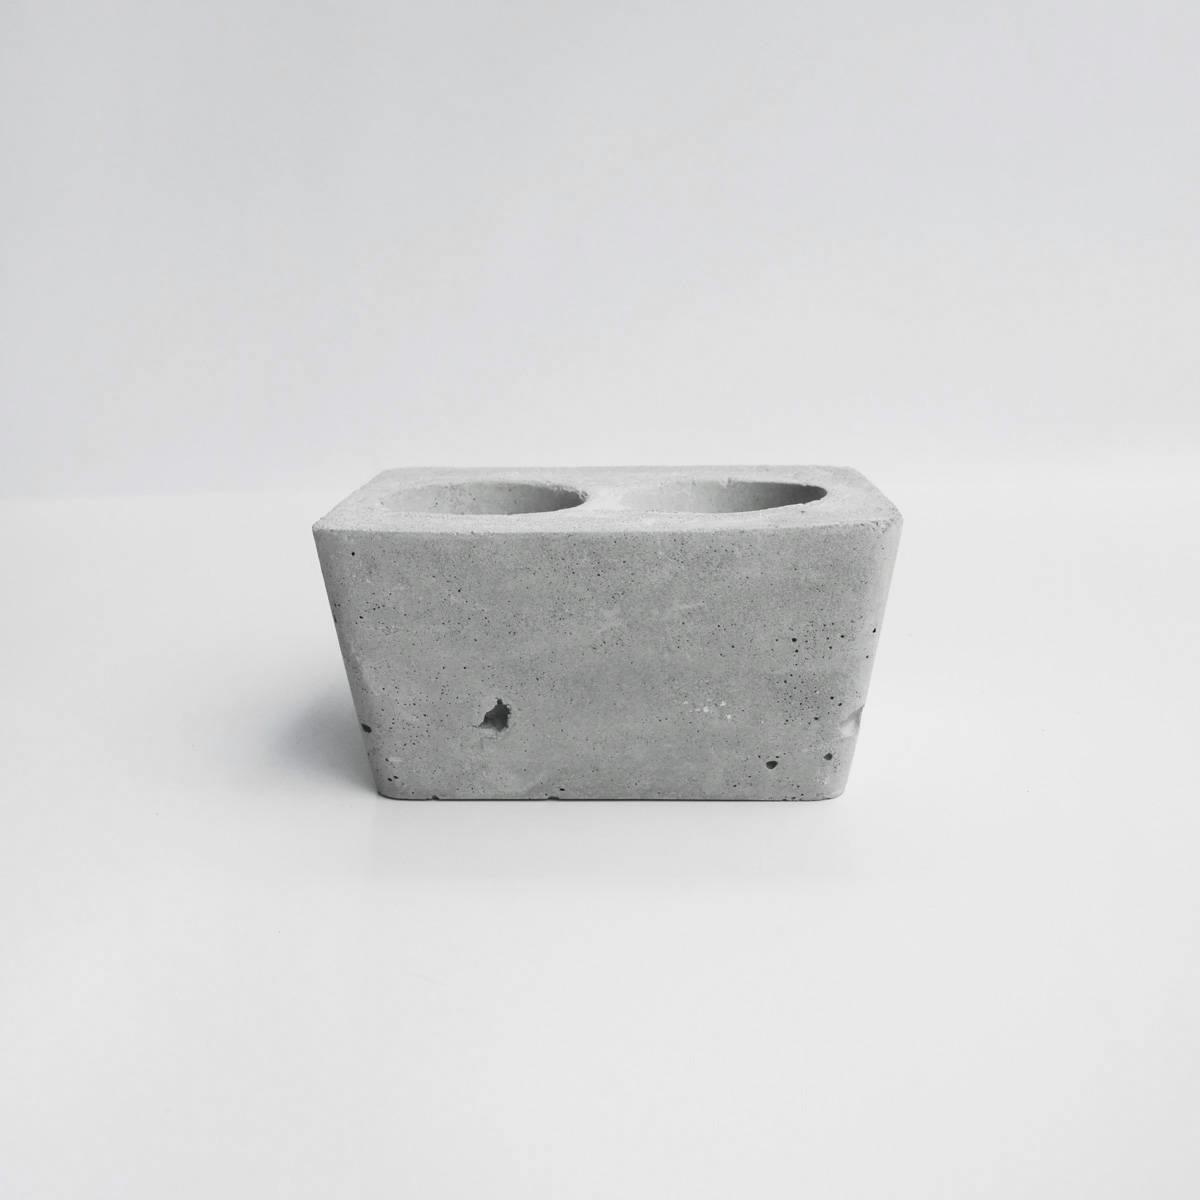 DUET 重奏磚型水泥盆器